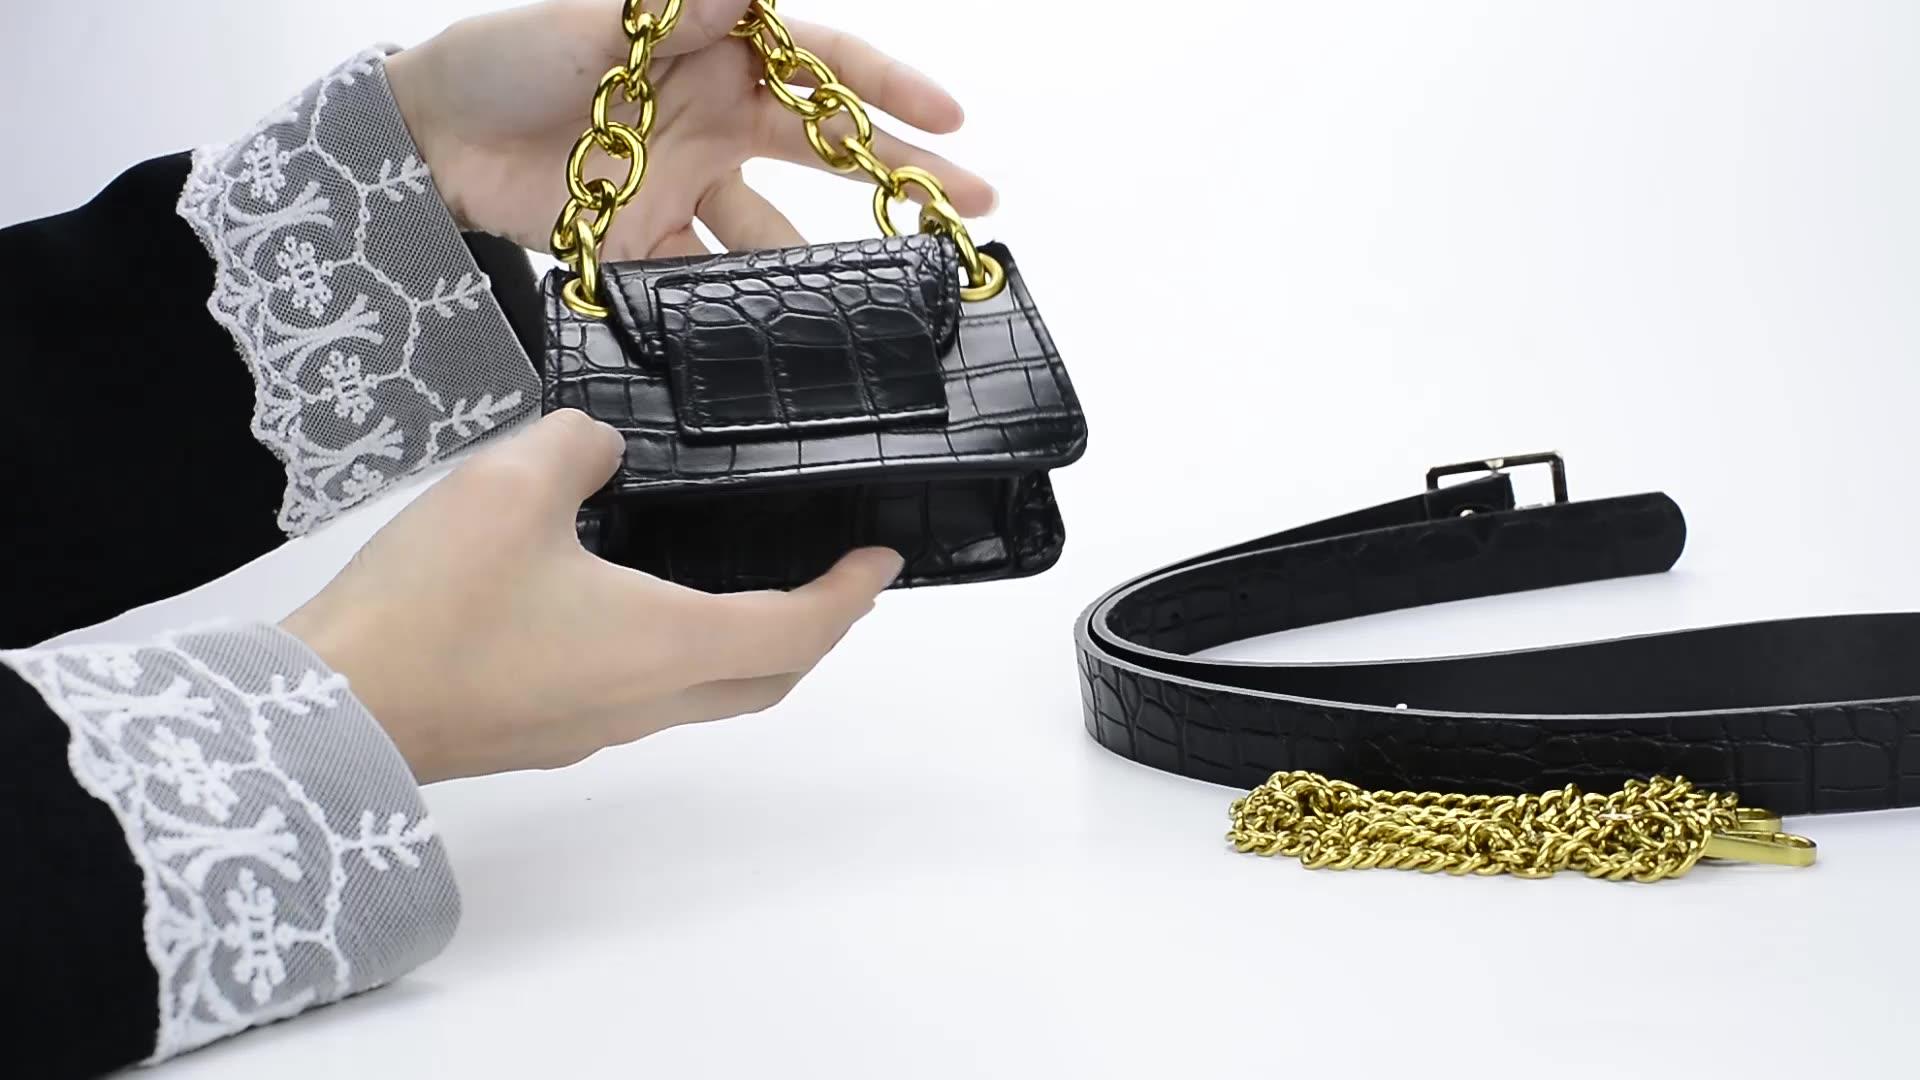 Crocodile Pattern Vintage Leather Metal Lock Crossbody Bags For Women Small Handbags Ladies Shoulder Messenger Bag